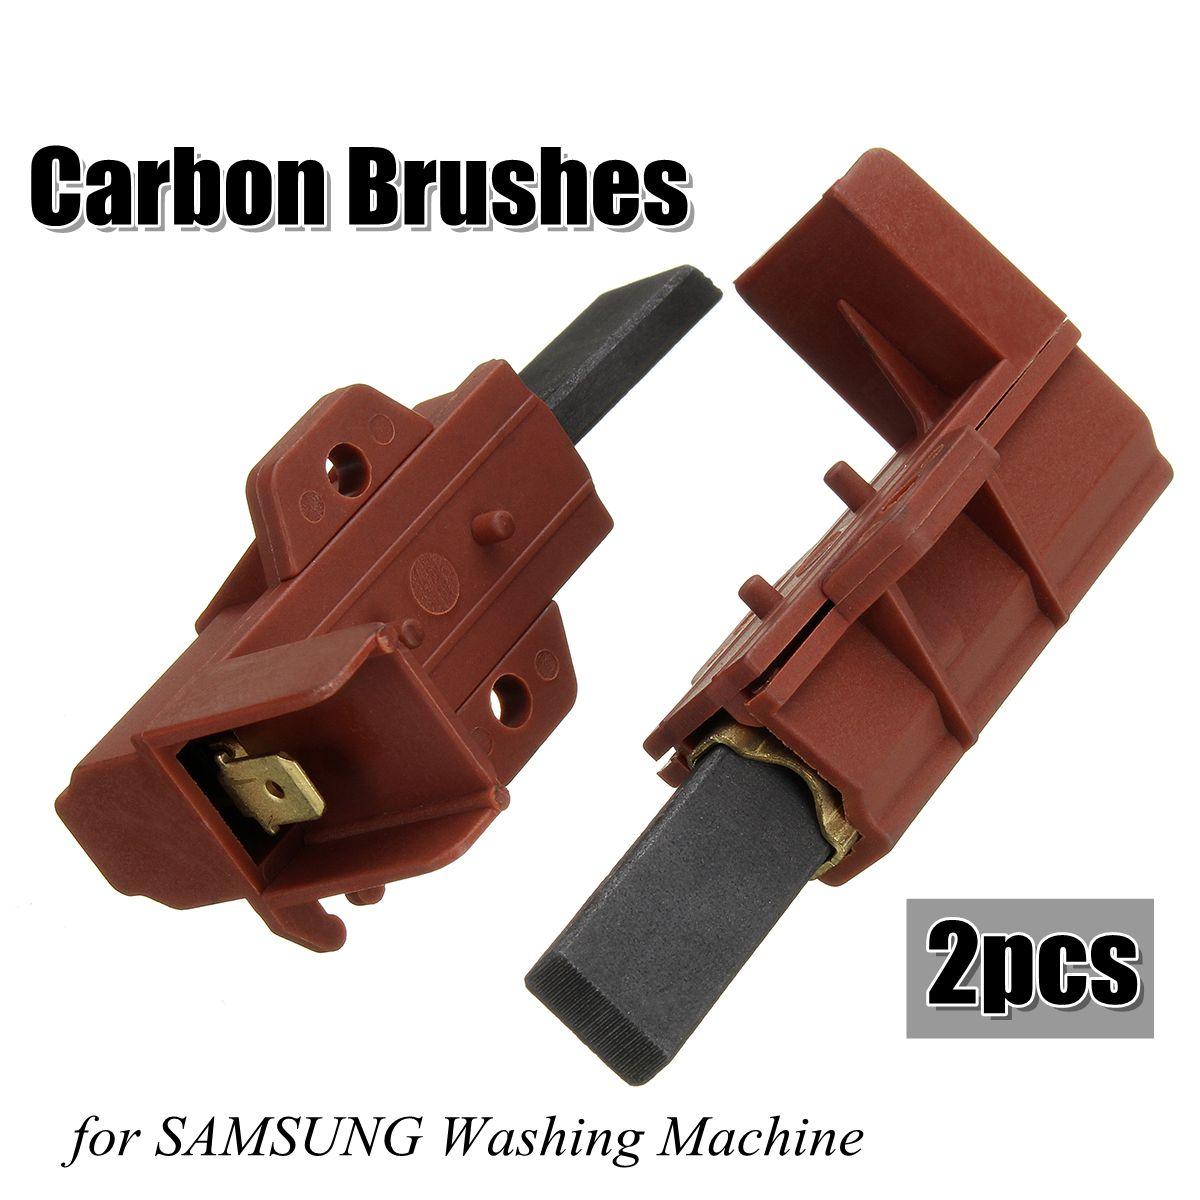 2pcs Washing Machine Motor Carbon Brush And Holder For SAMSUNG Ariston Indesit Welling